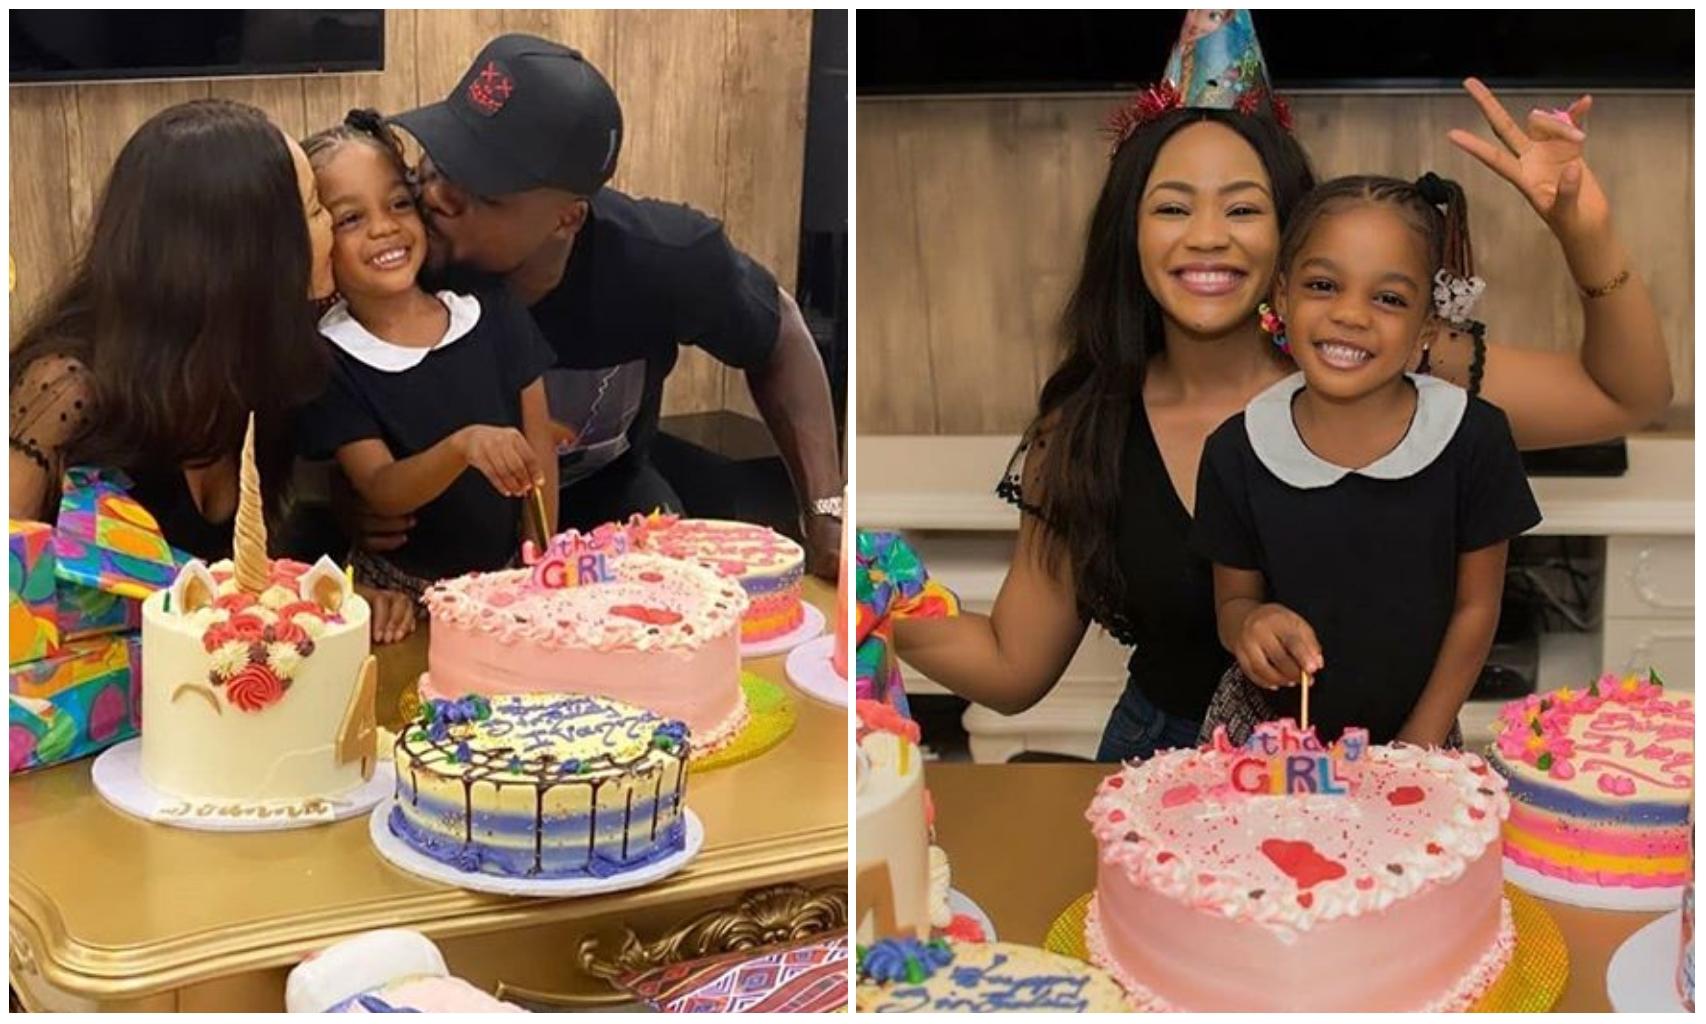 Suepr Eagles star, John Ogu and ex-wife reunites to celebrate daughter's birthday (Video/Photos)